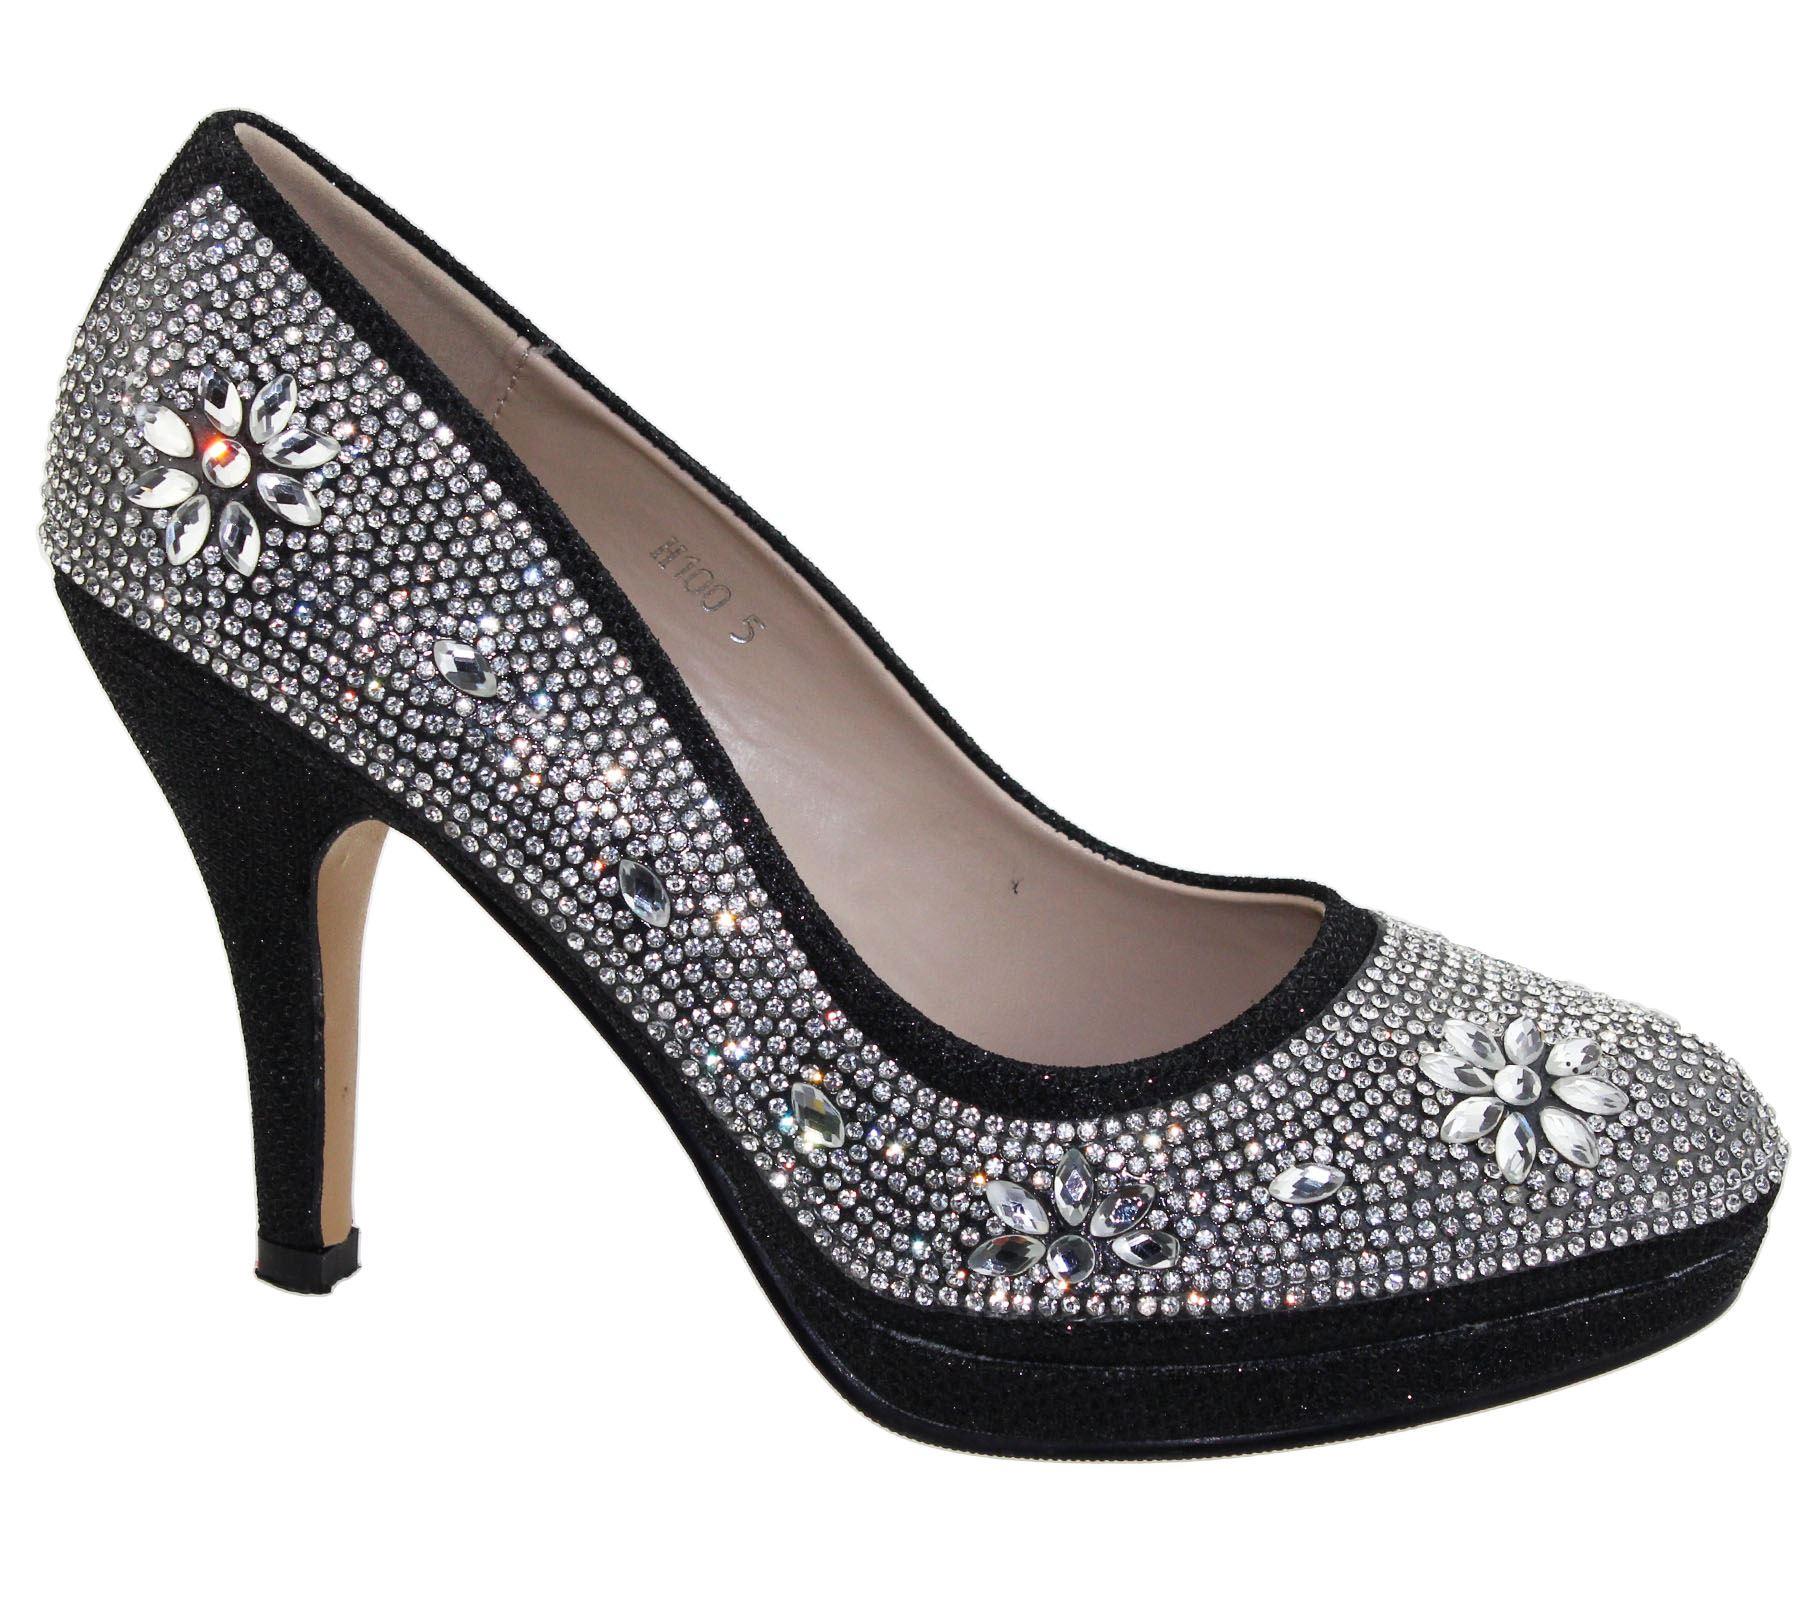 Womens-Platforms-High-Heels-Wedding-Bridal-Evening-Diamante-Ladies-Party-Shoes miniatura 5